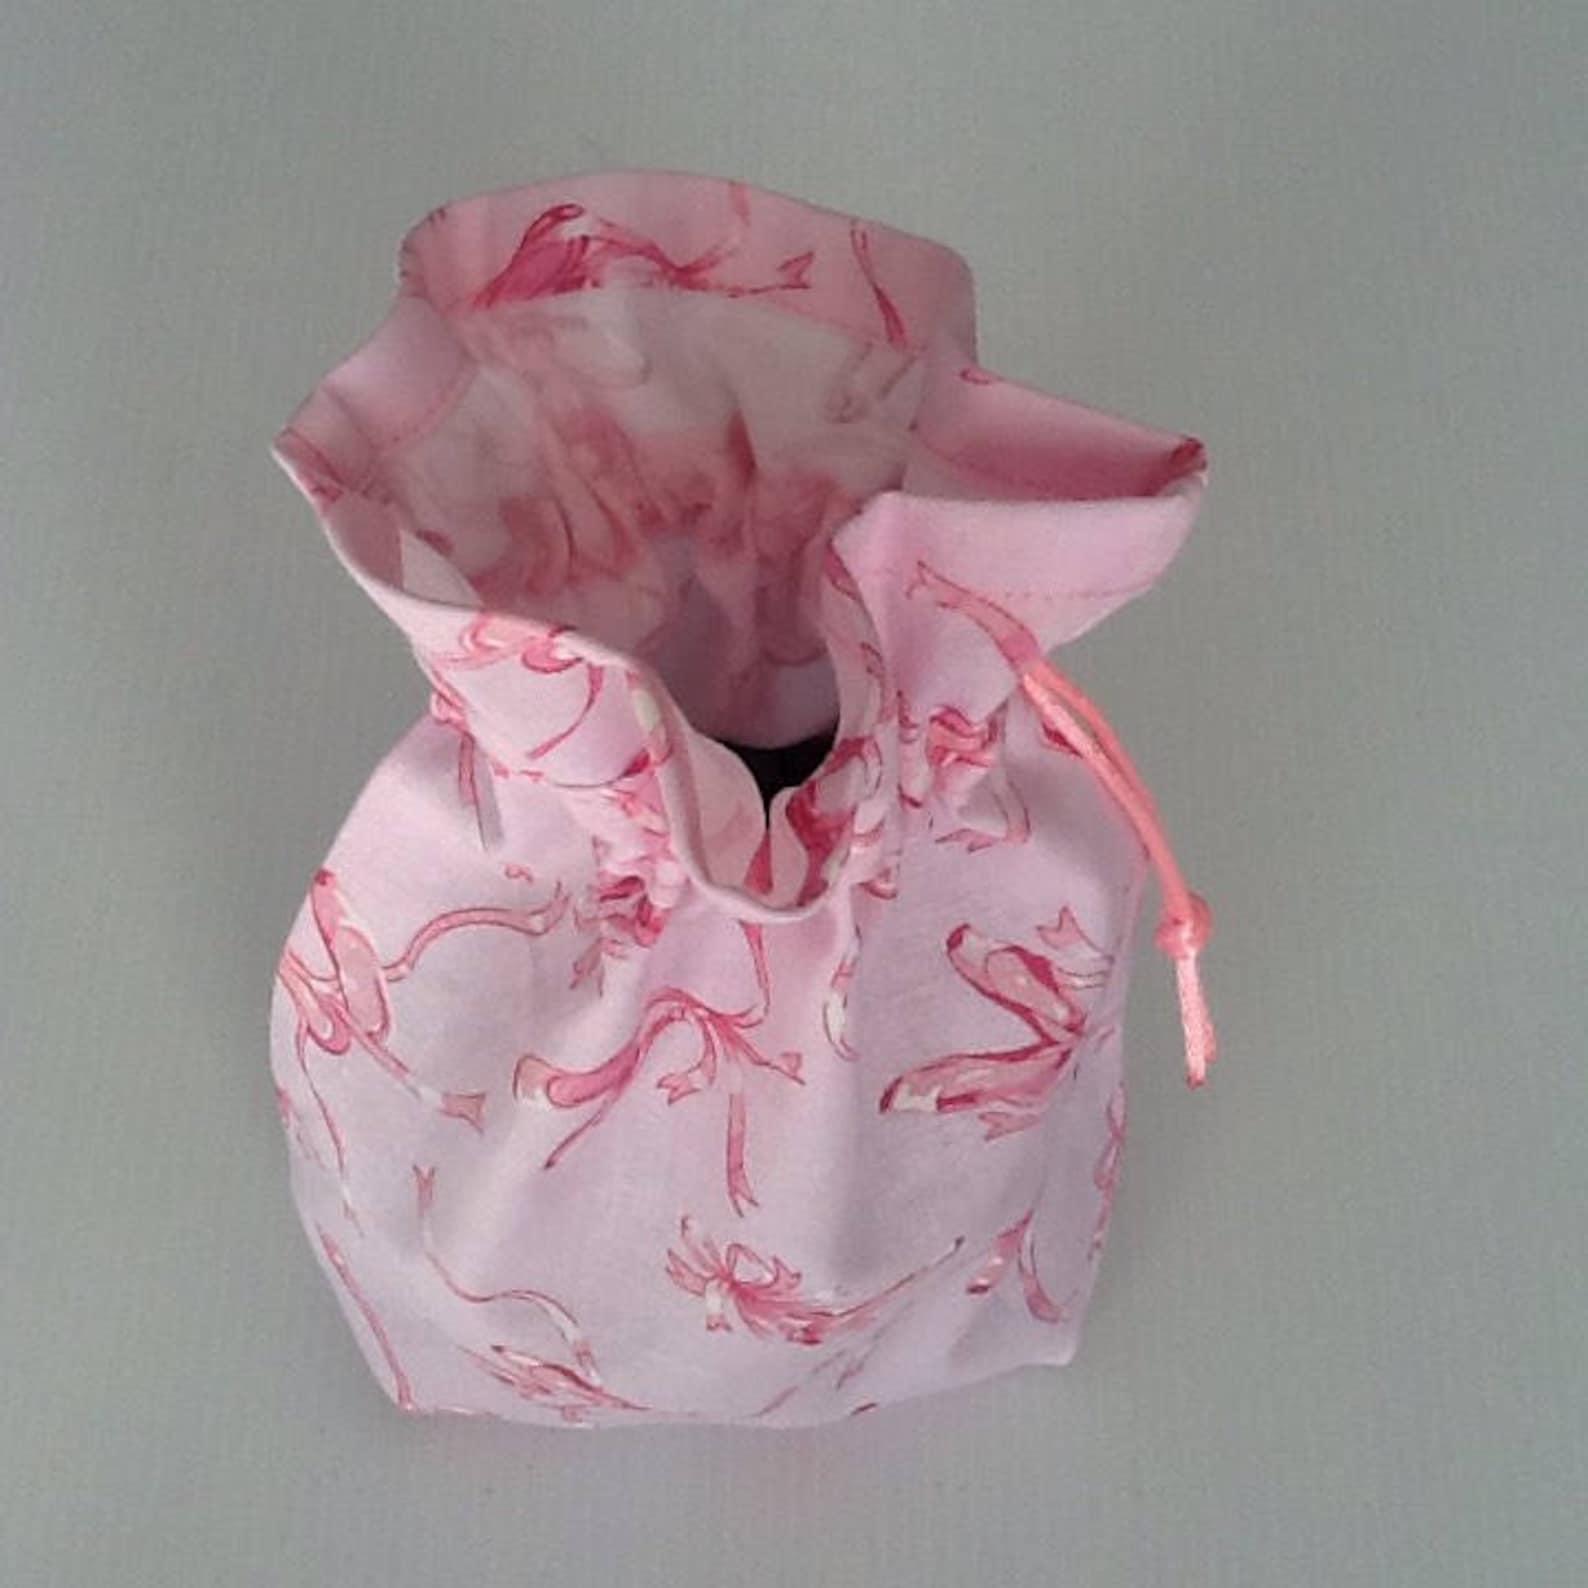 draw string bag / dog poopbag bag / ballet shoes / dog treat bag / collar accessories / dog lead attachment / australian handmad